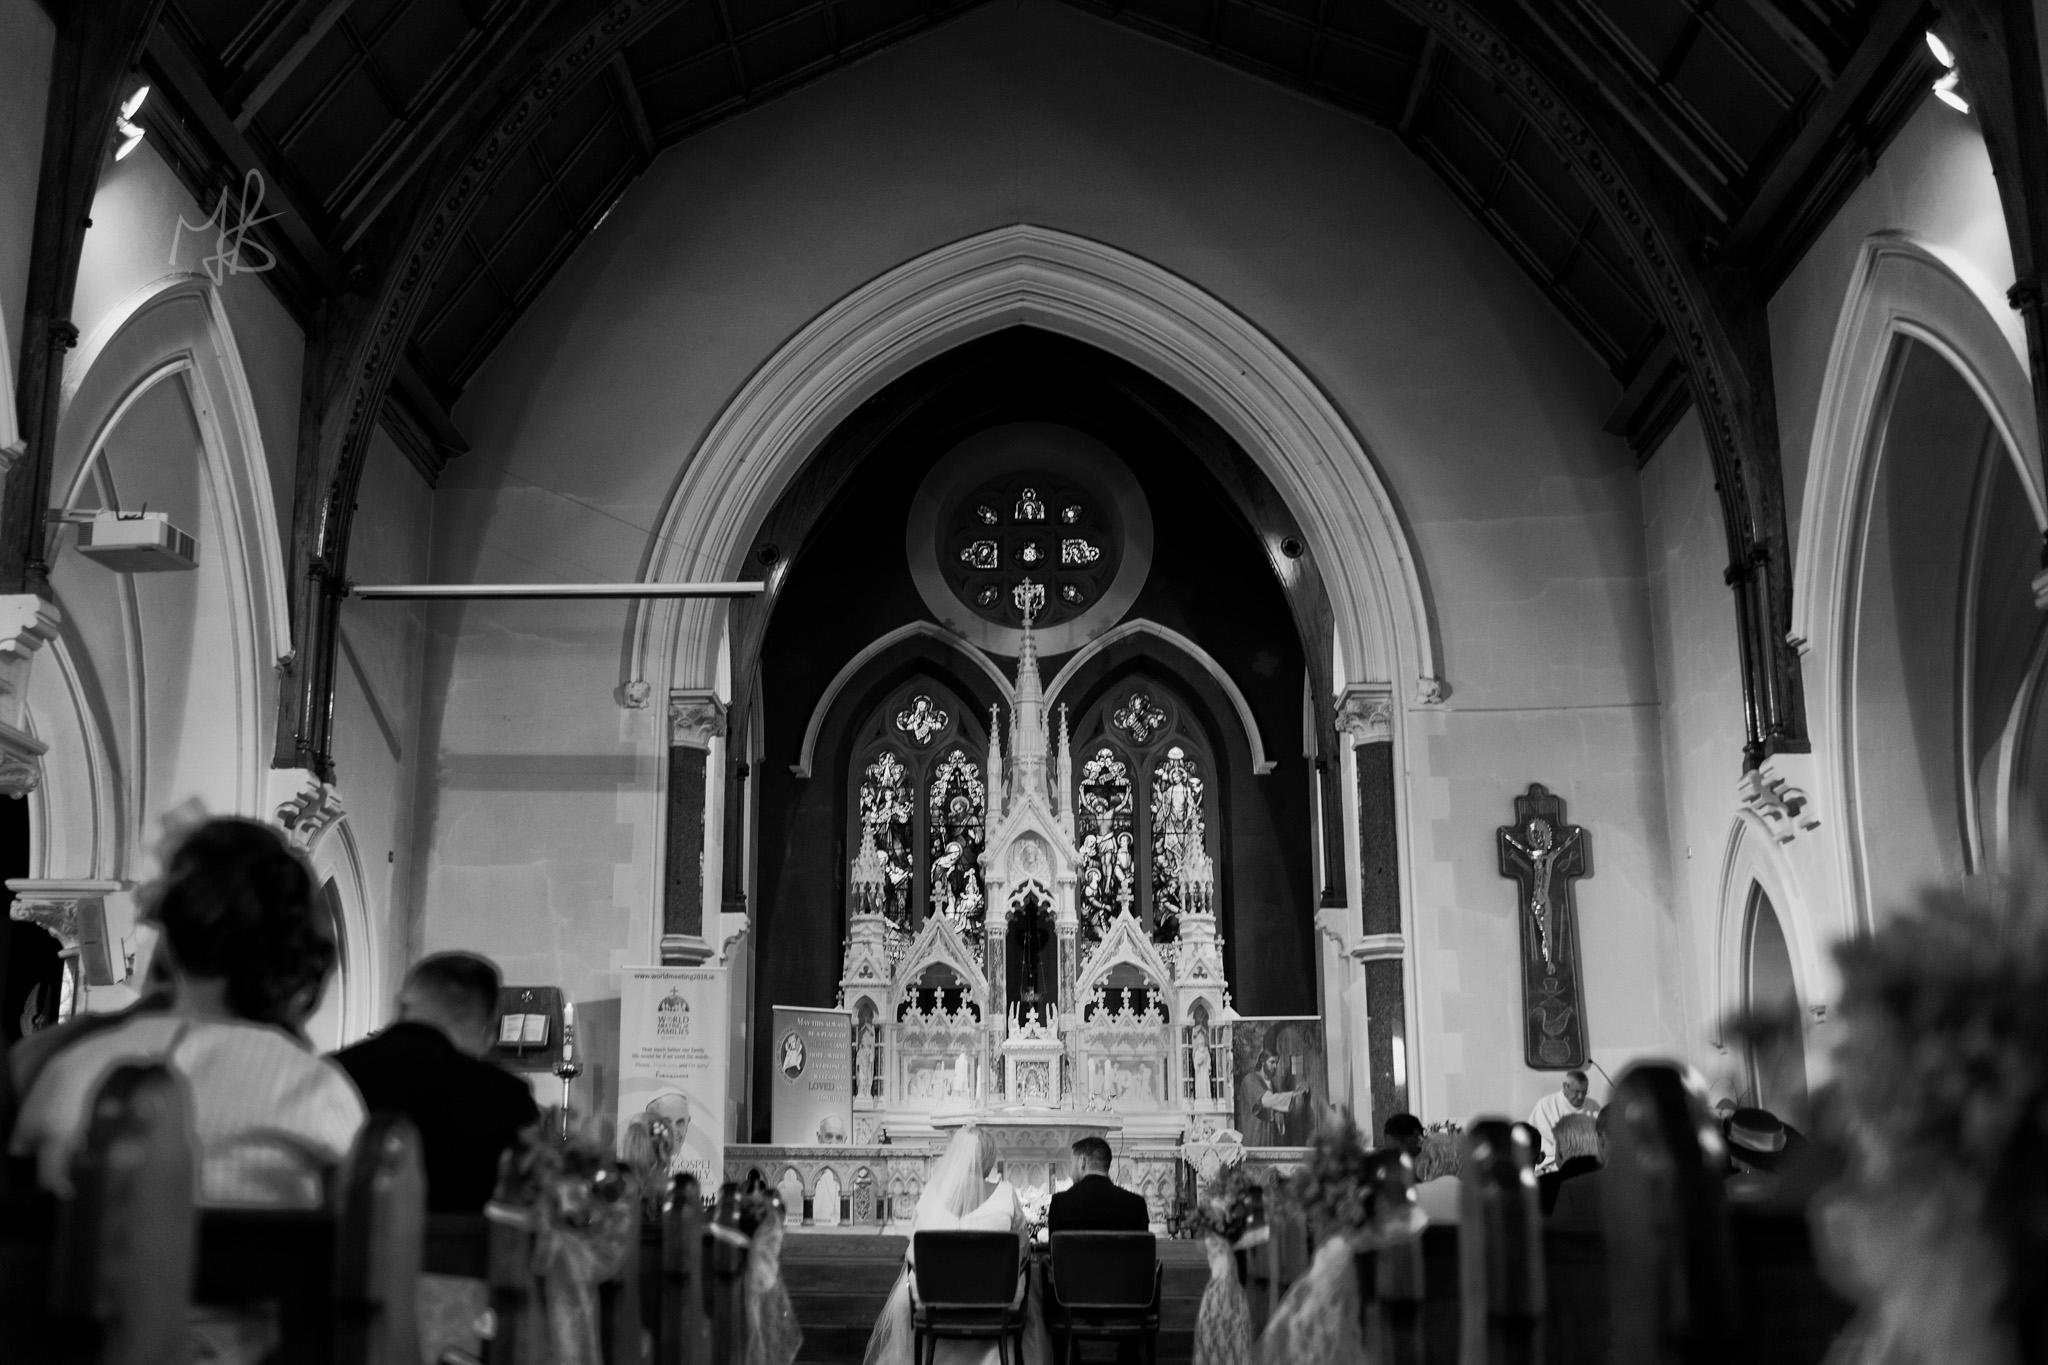 Northern-Ireland-Wedding-Photographer-Mark-Barnes-Ballymena_wedding-photography-Leighinmohr-House-Seamas_Alanna_For-web-22.jpg